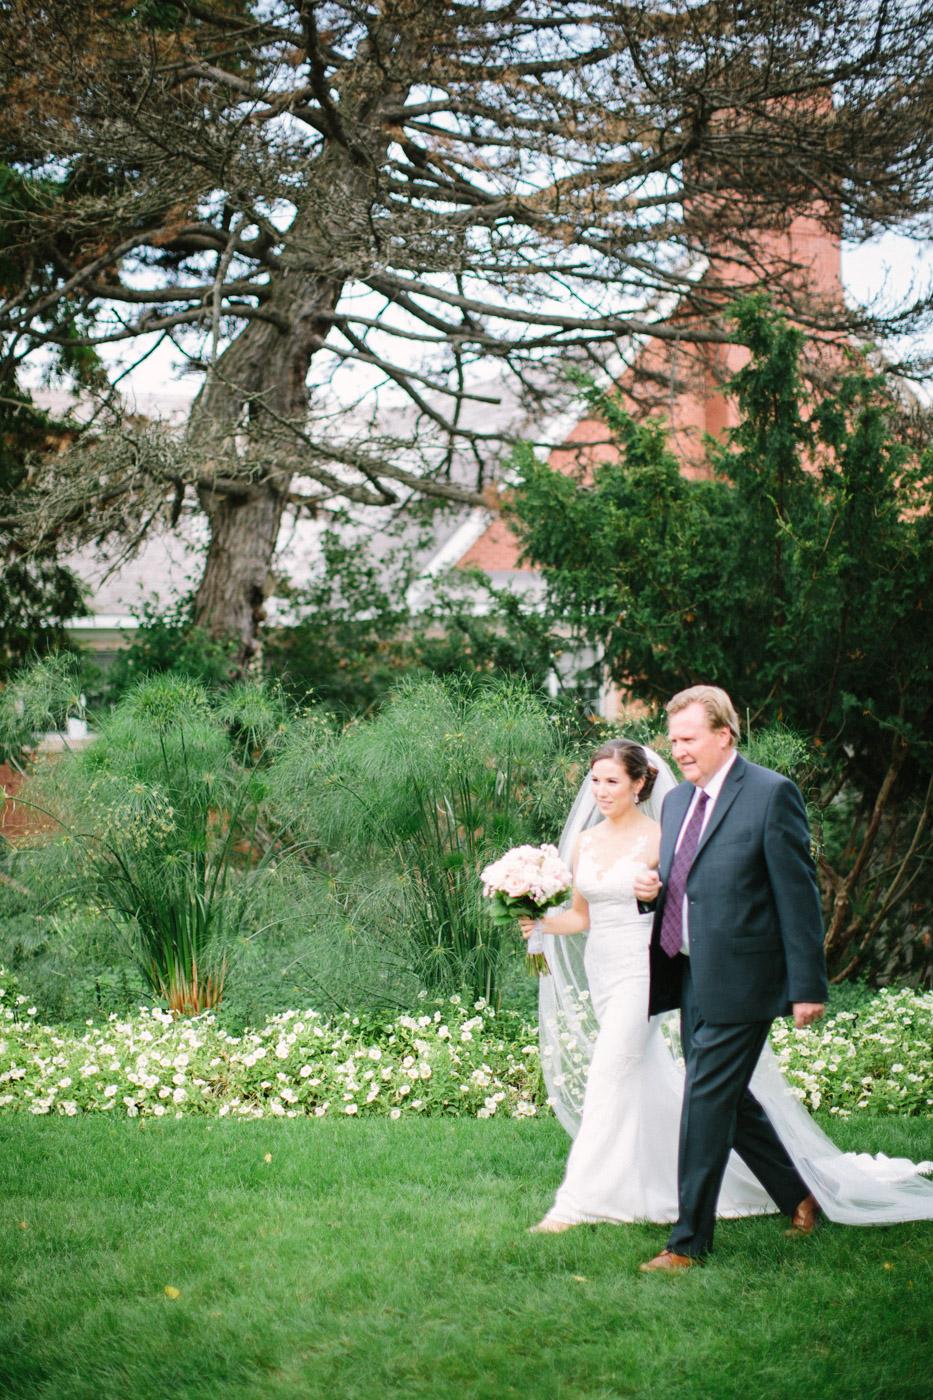 Kelly & Ben Wedding Web 2016-126.jpg